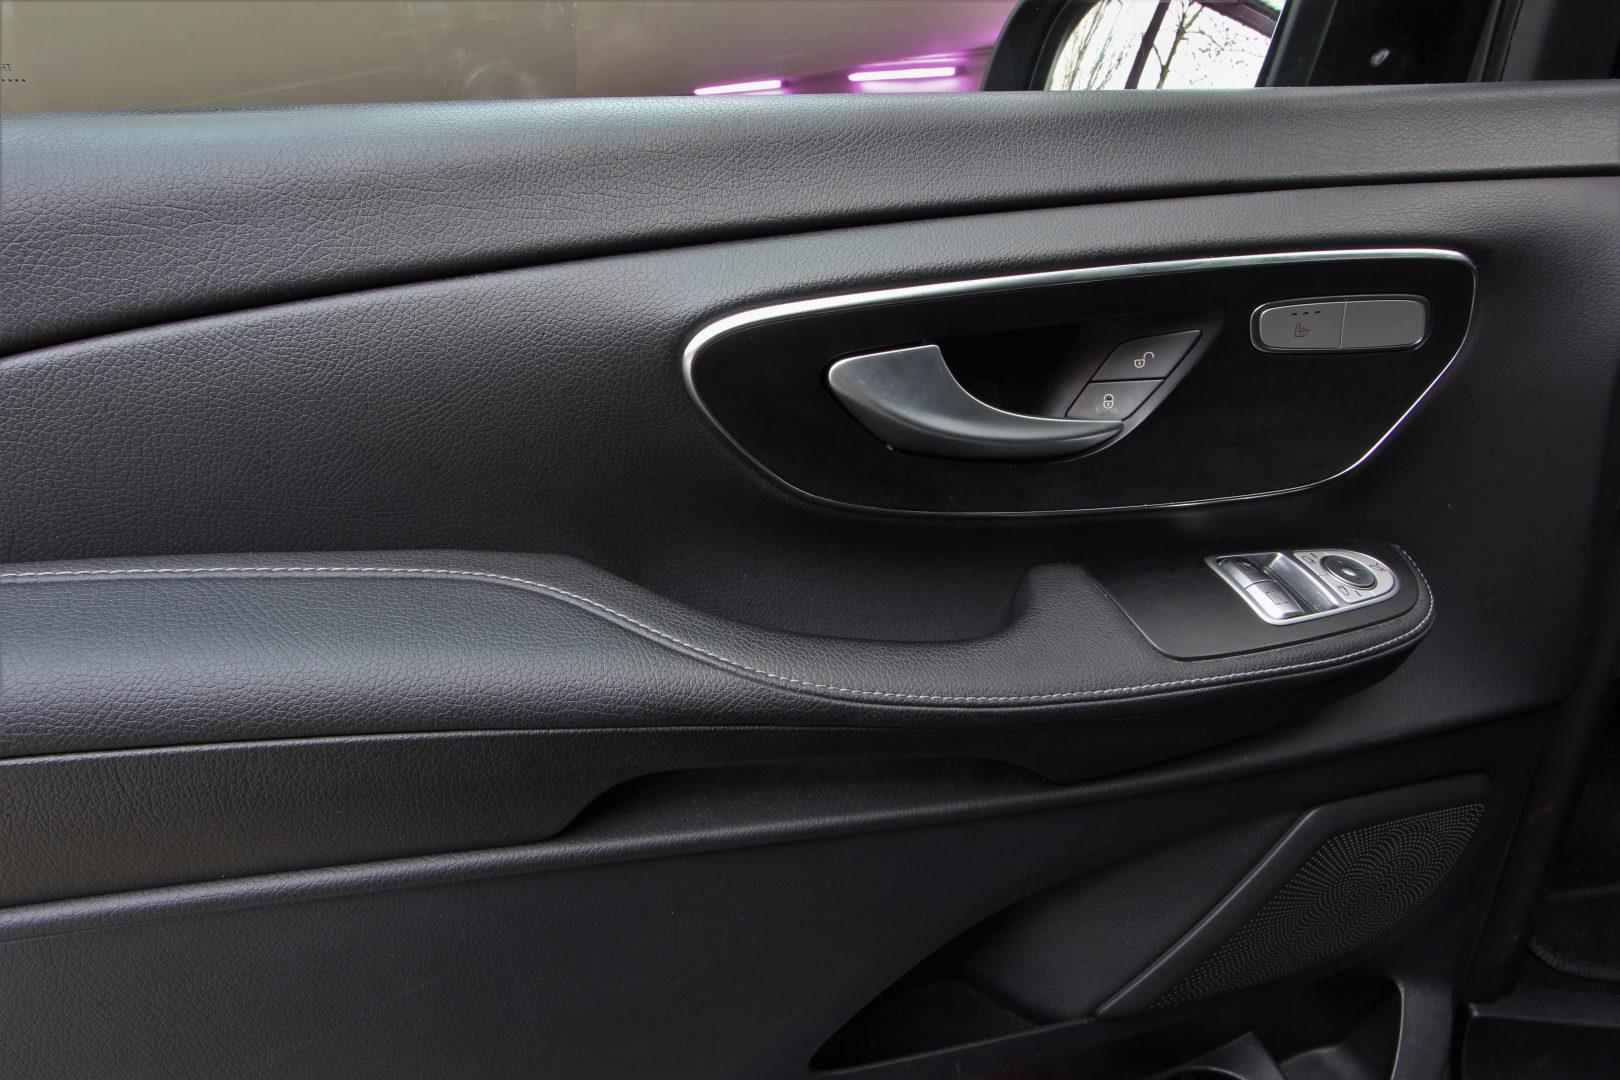 AIL Mercedes-Benz V 250 CDI/BT/d AVANTGARD LED  11